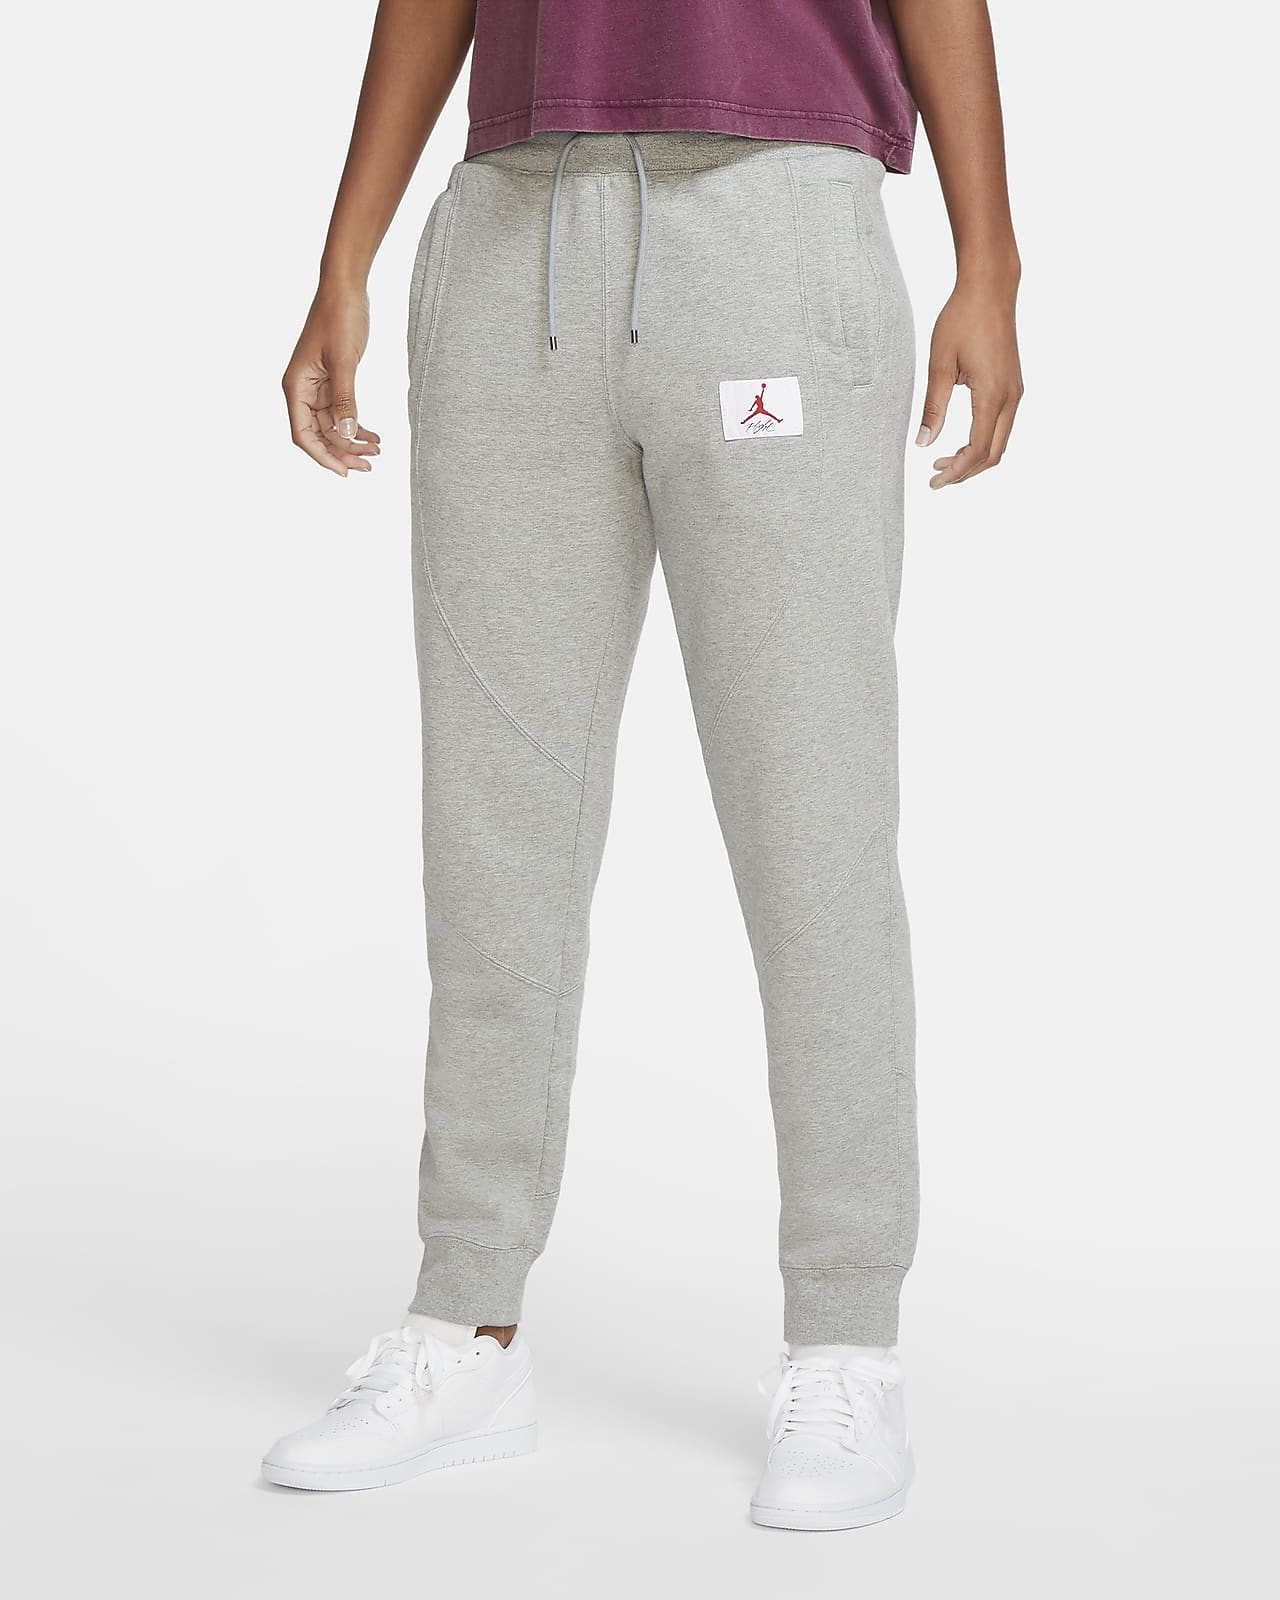 Pantalon en tissu Fleece Jordan Flight pour Femme